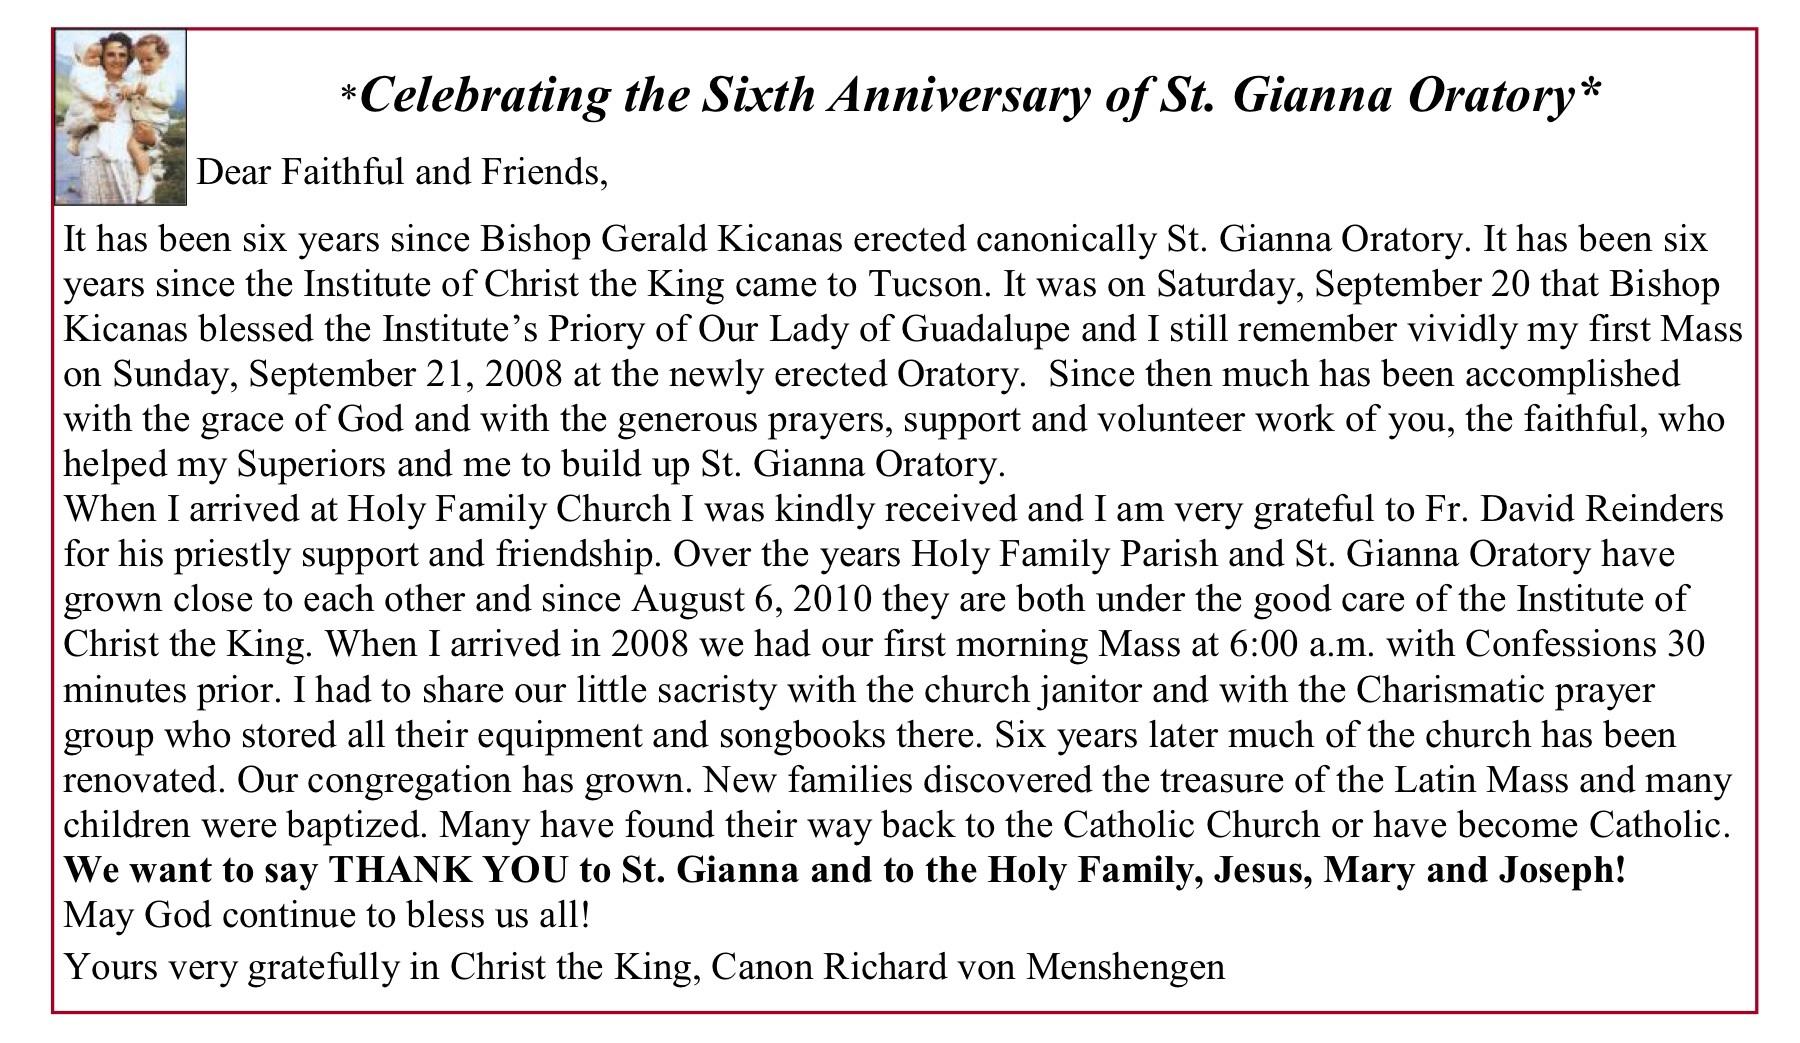 Happy Anniversary to St Gianna Oratory inTucson!